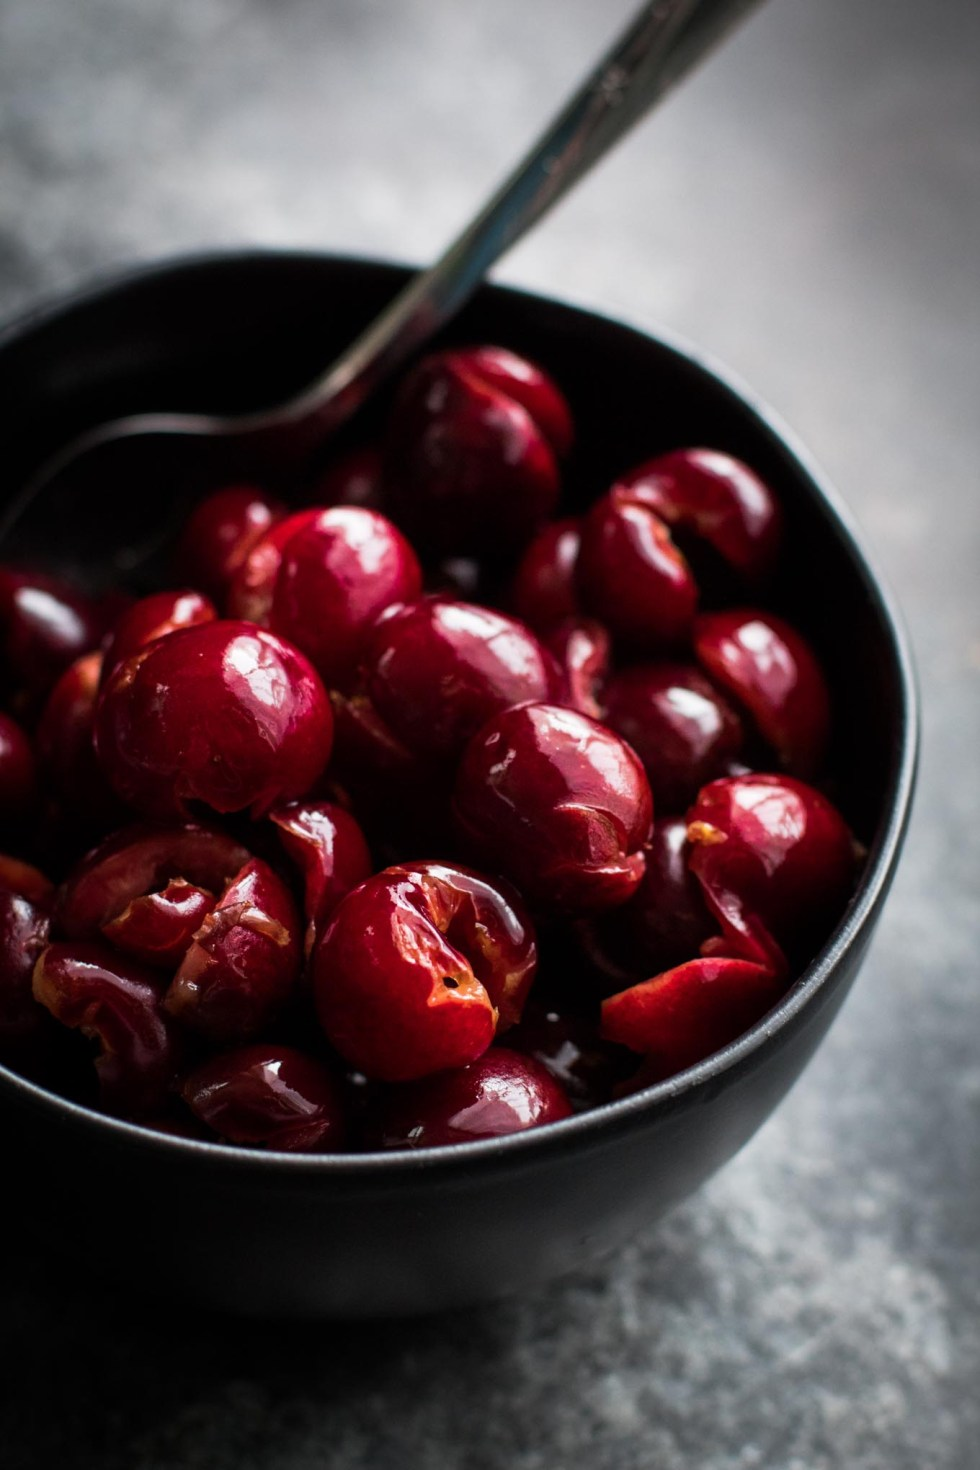 Black bowl of bourbon-soaked cherries